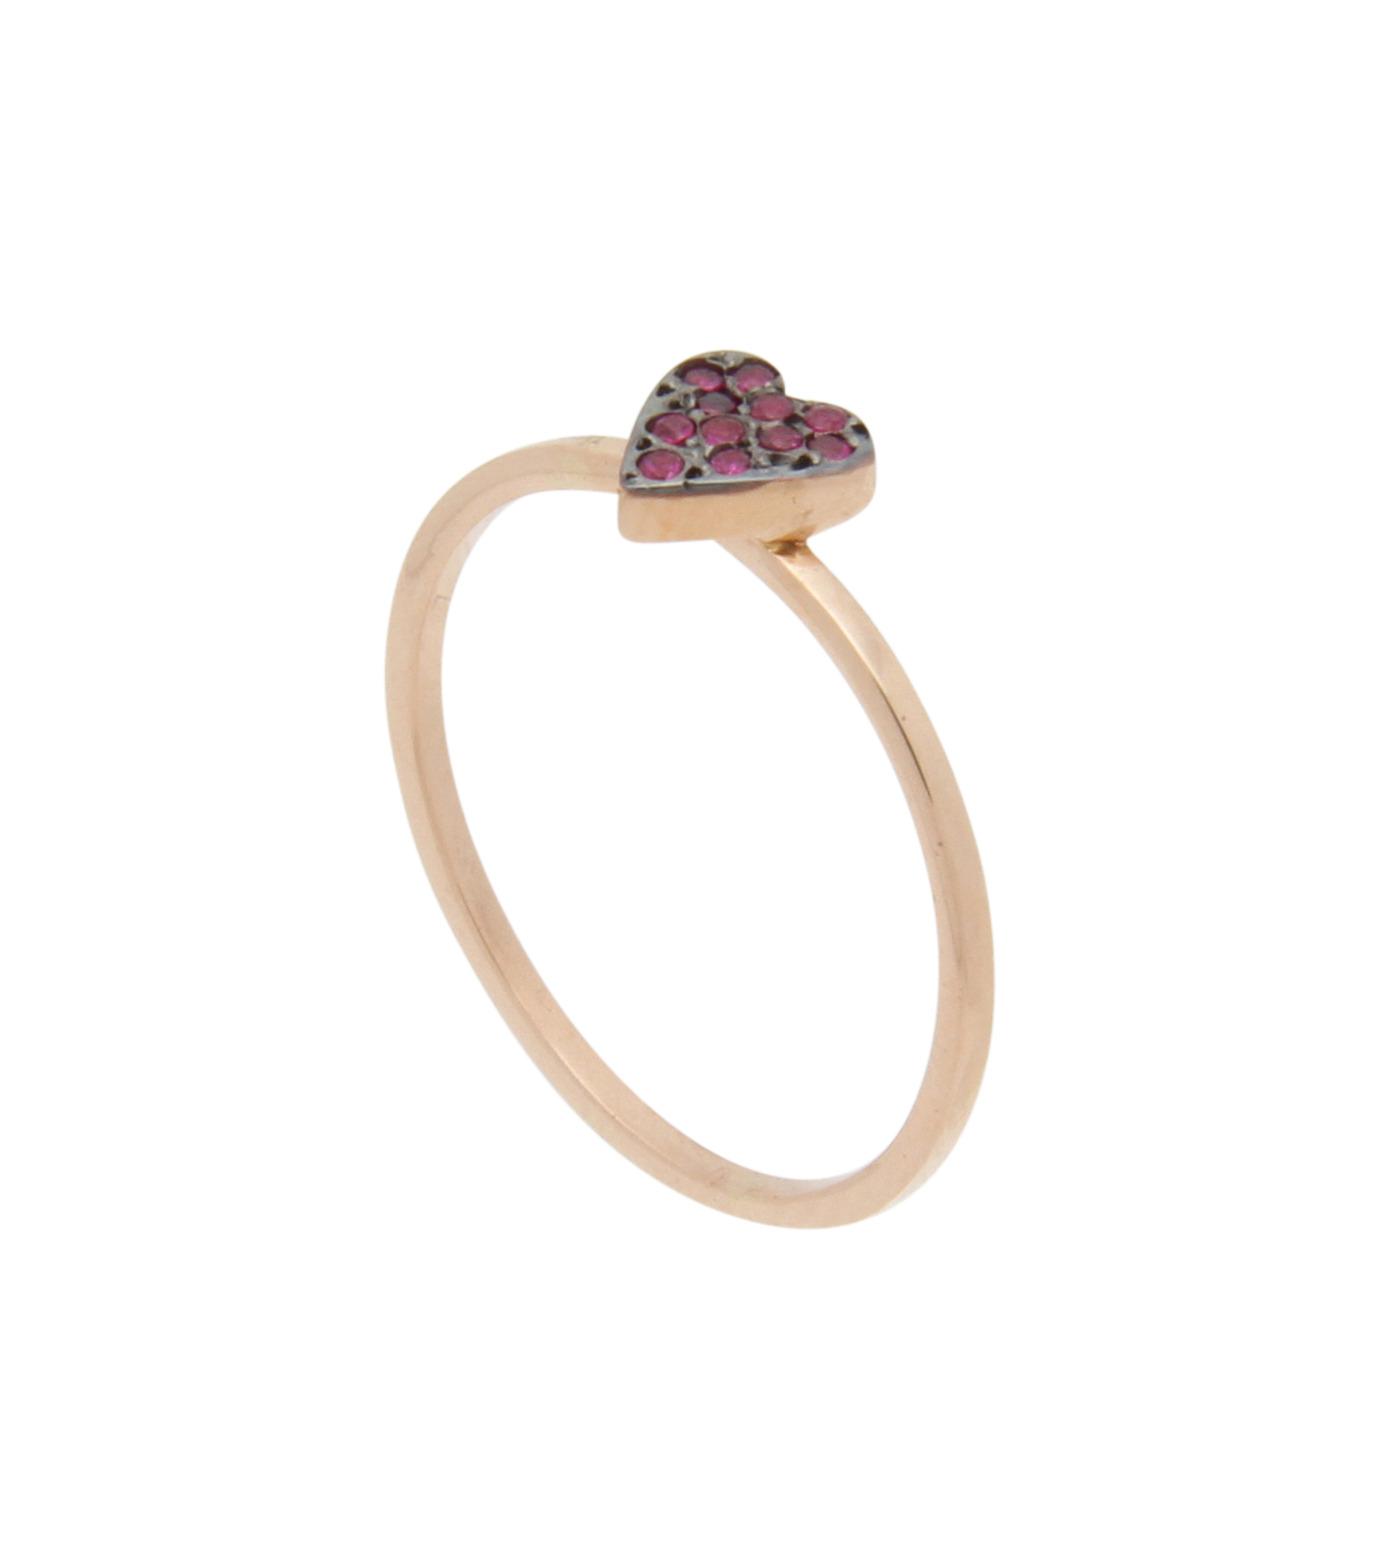 Ileana Makri(イリーナ マクリ)のLove Ring Pink Gold-Ruby-ROSE(リング/ring)-O272-39-006-75 拡大詳細画像2